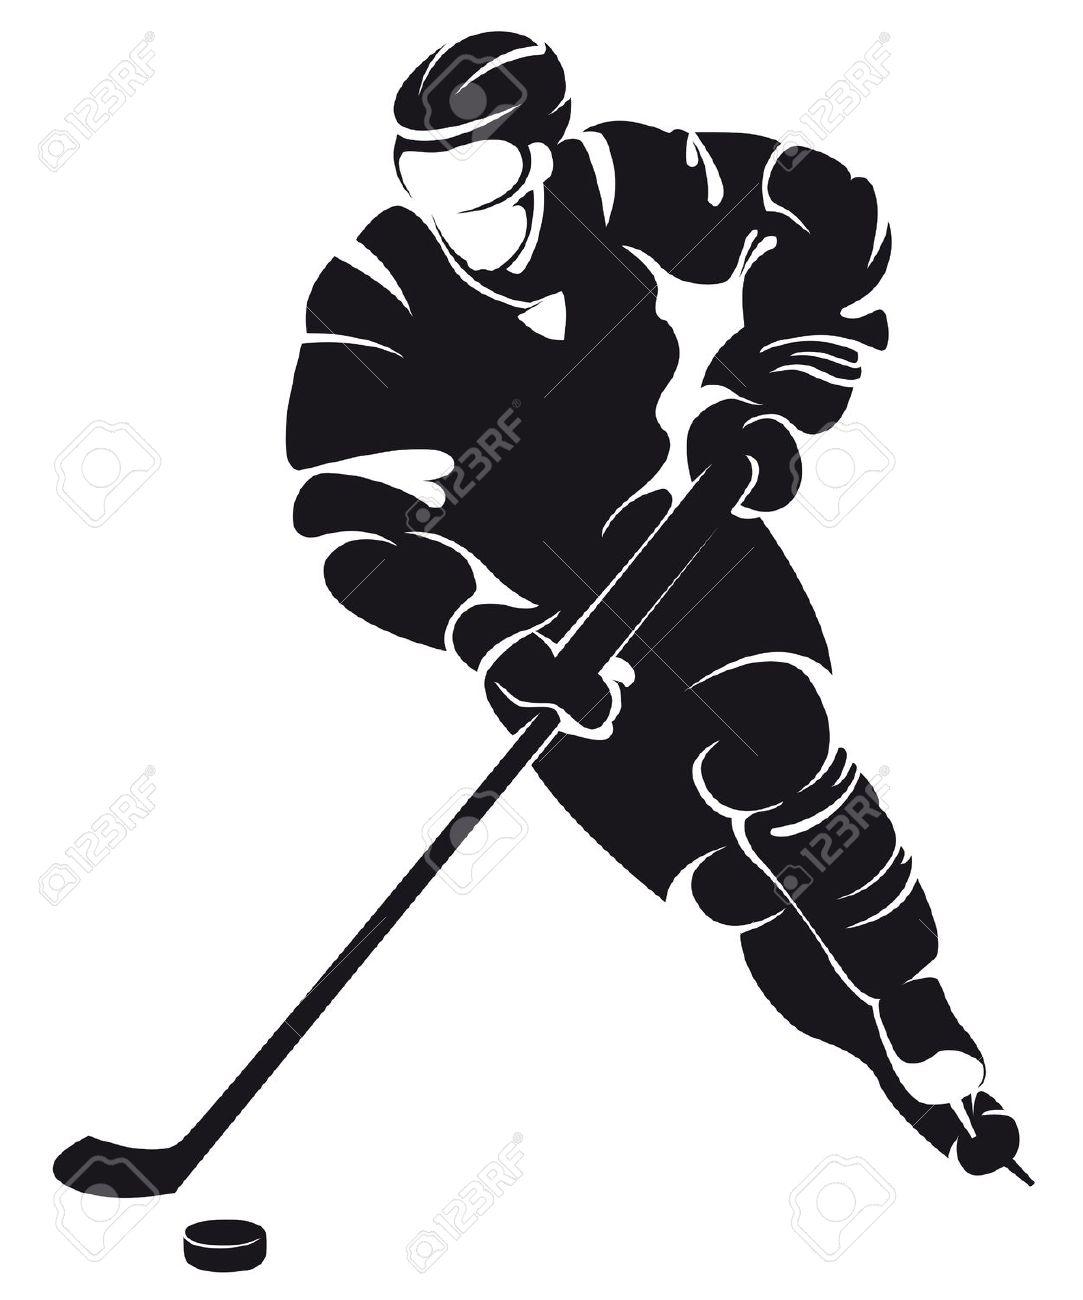 Hockey clipart vector free - ClipartFest